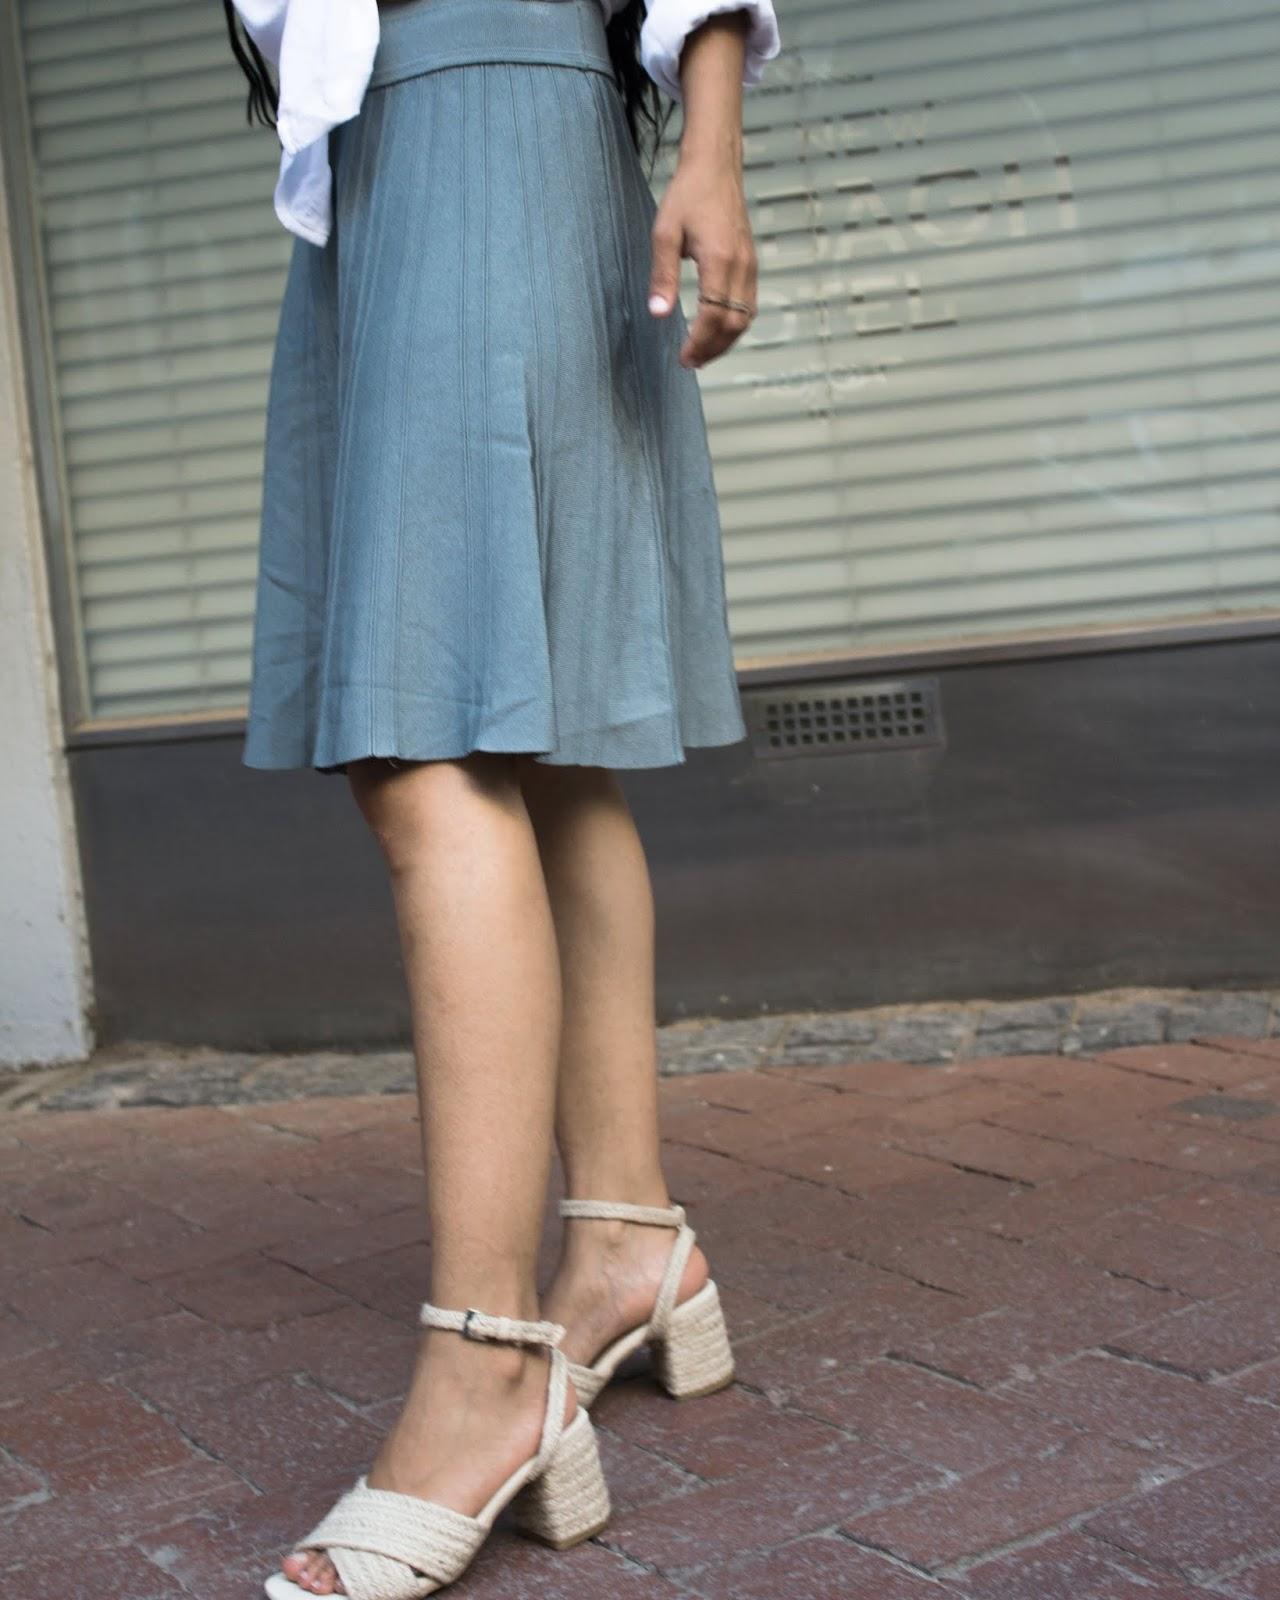 Liezel-Esquire-must-have-woven-sandals